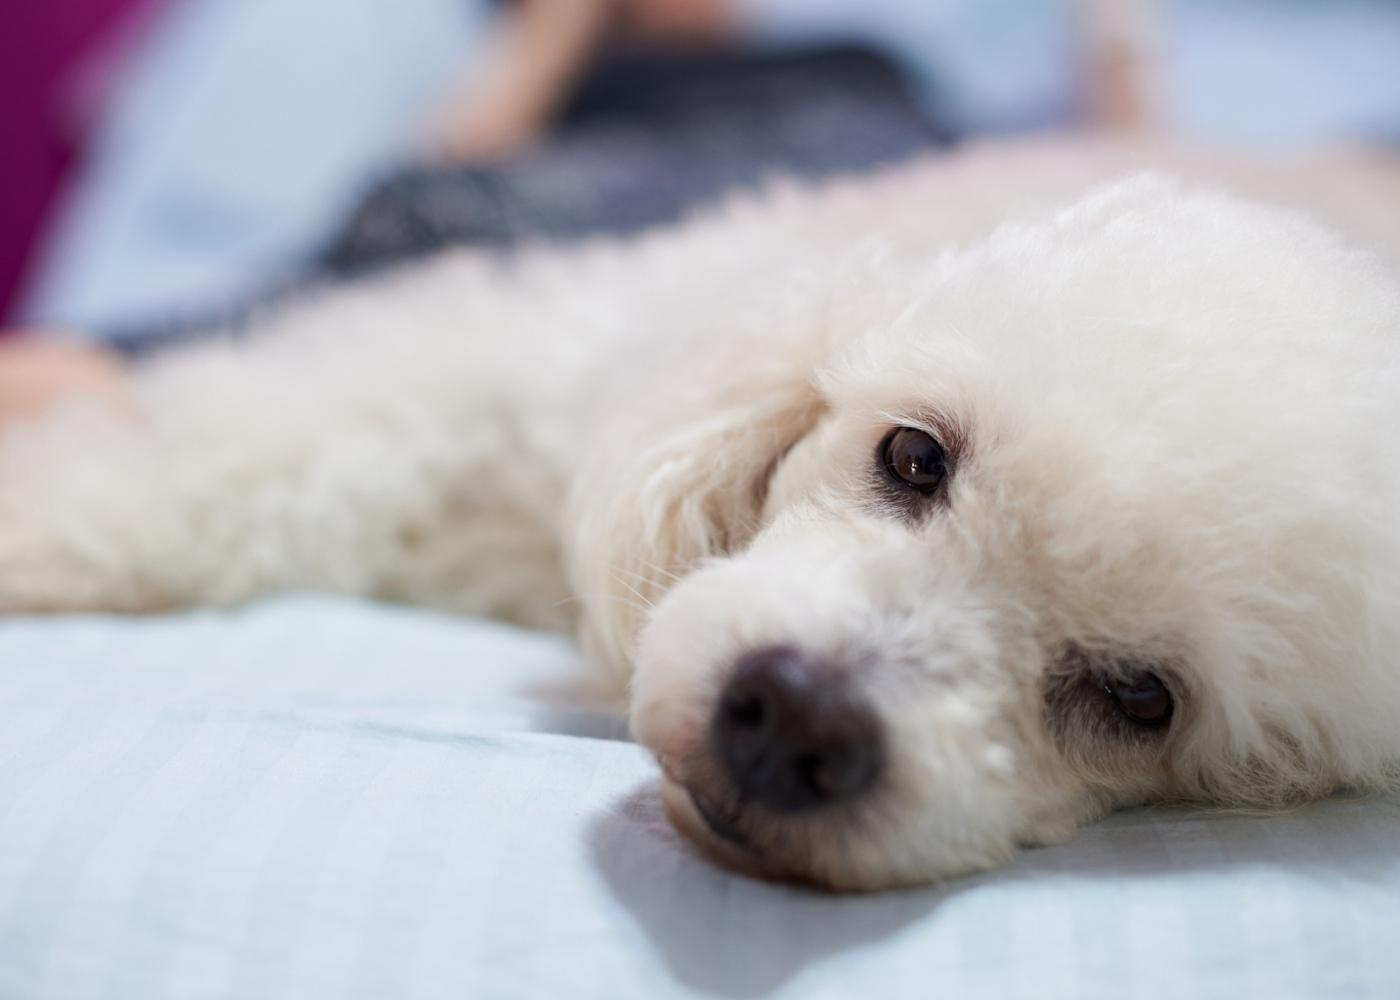 Caniche deitado numa cama